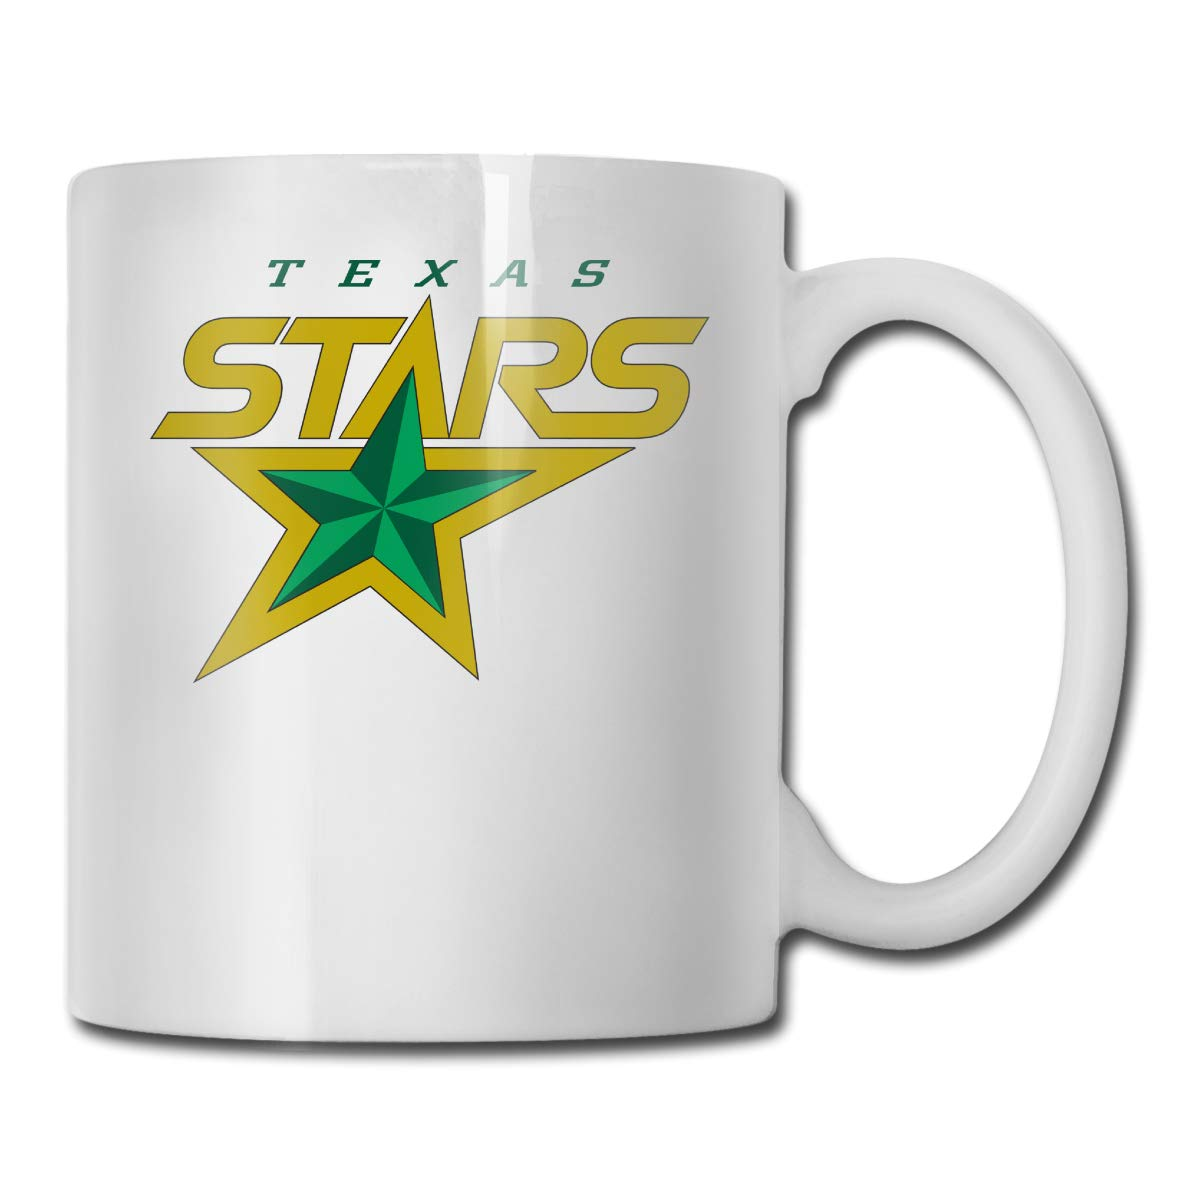 White One Size Office Coffee Cup HockeyLogoTexasStars Geblackus 14.72 OZ Capacity Mug is Perfect for CoffeeWhite